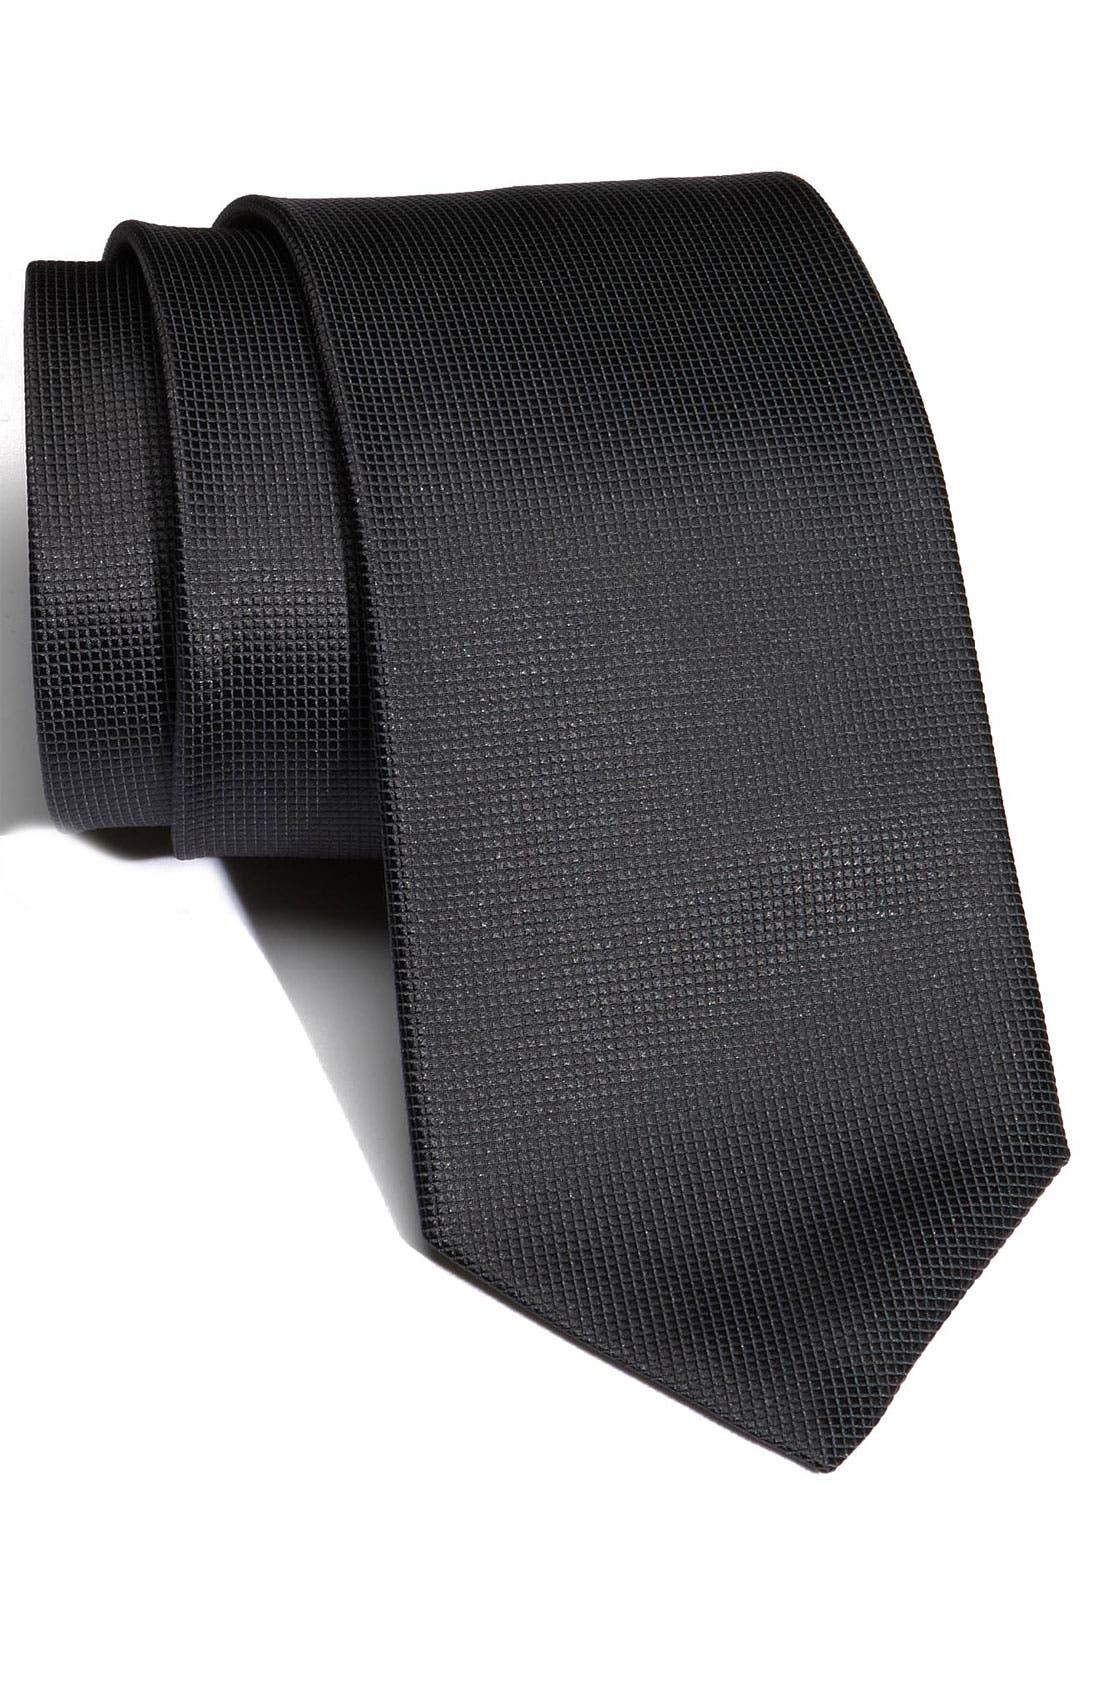 Main Image - BOSS Woven Silk Tie